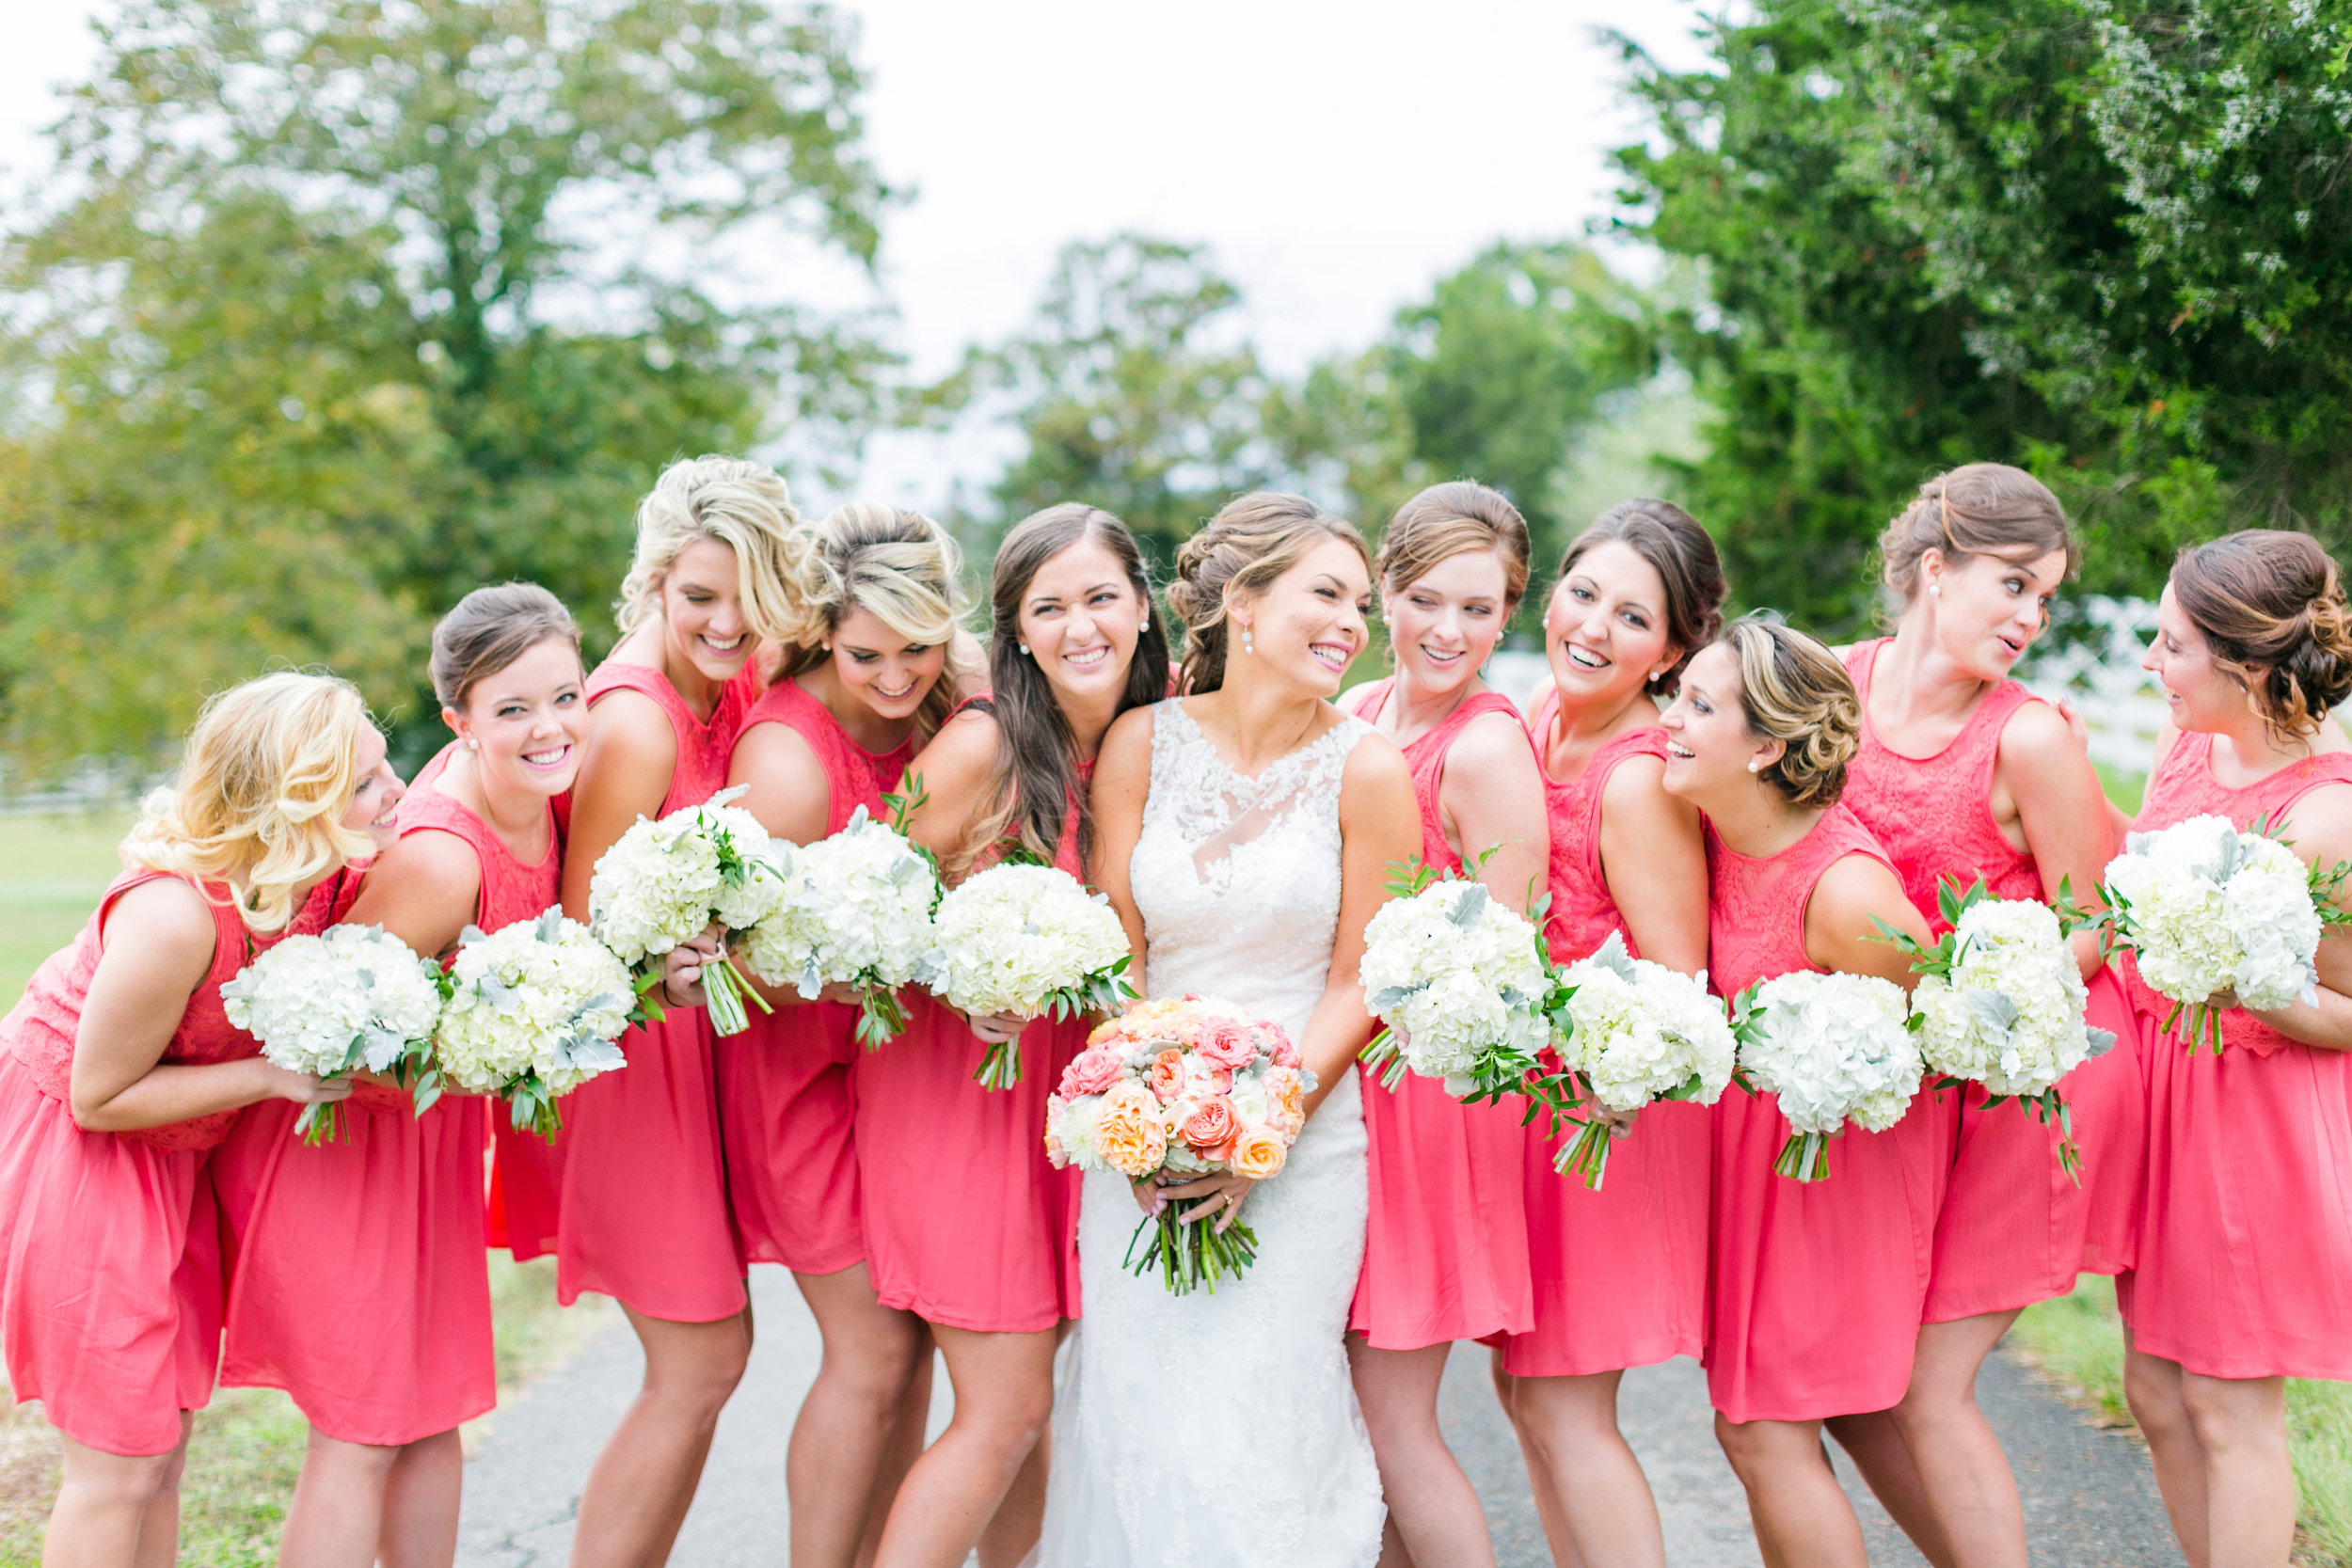 Stone Tower Winery Wedding Photos Virginia Wedding Photographer Megan Kelsey-10.jpg